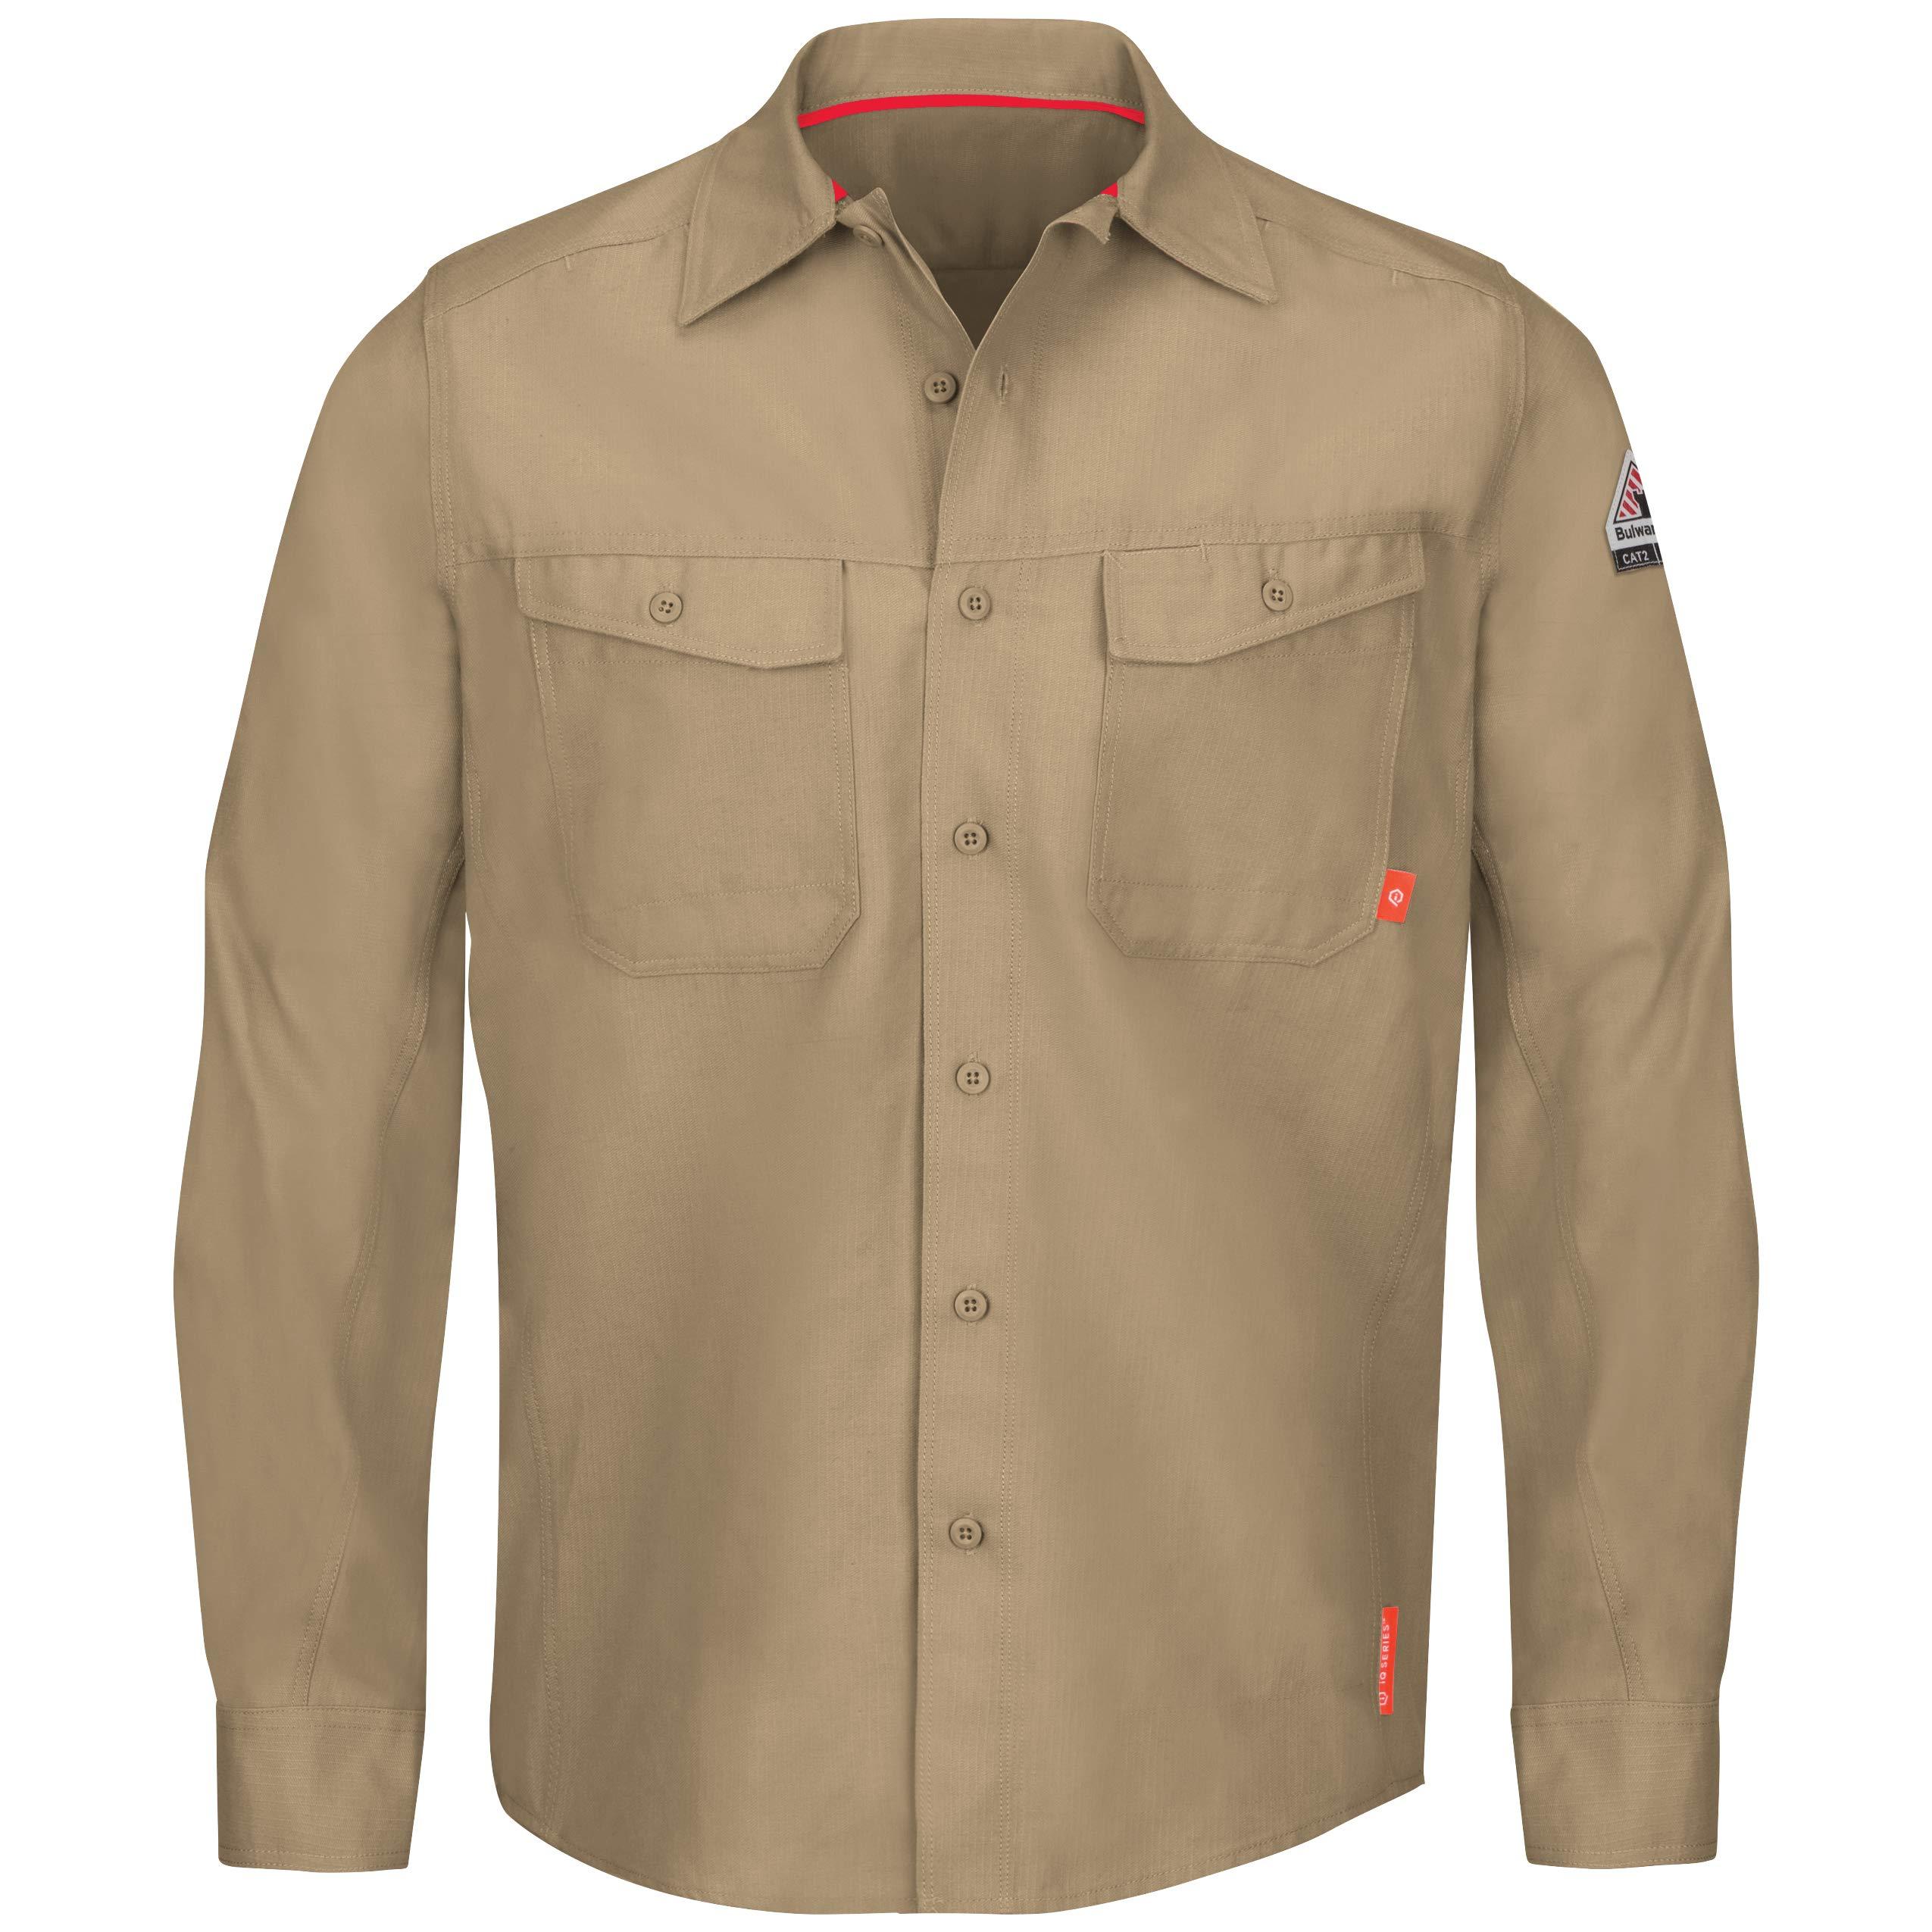 Bulwark Men's Iq Series Endurance Work Shirt, Khaki, 3X-Large